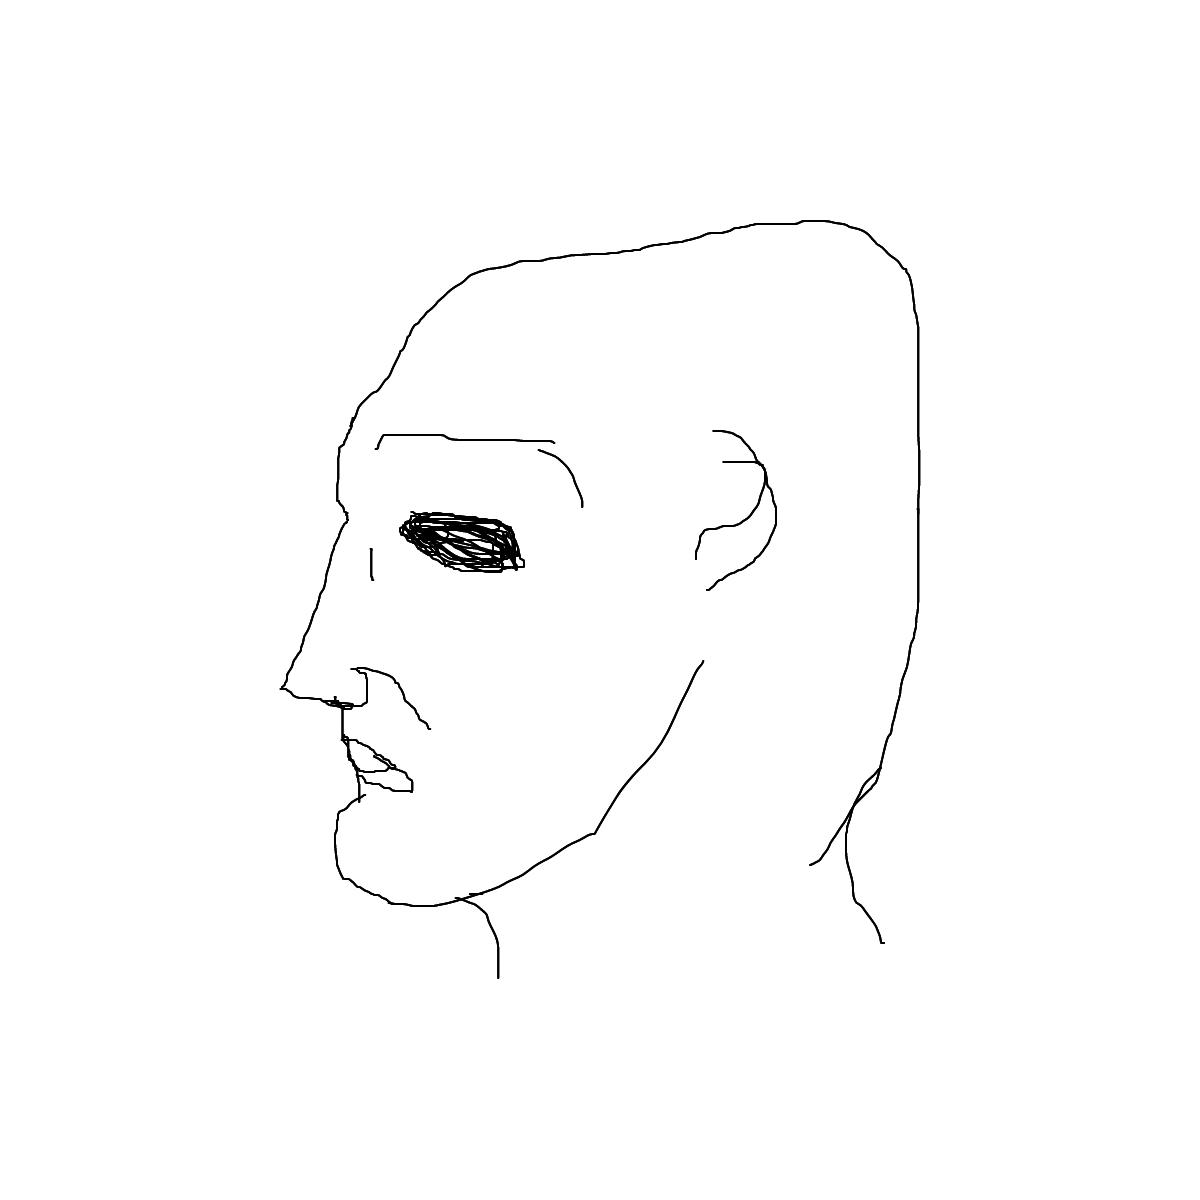 BAAAM drawing#24632 lat:52.4772605895996100lng: 13.4061670303344730